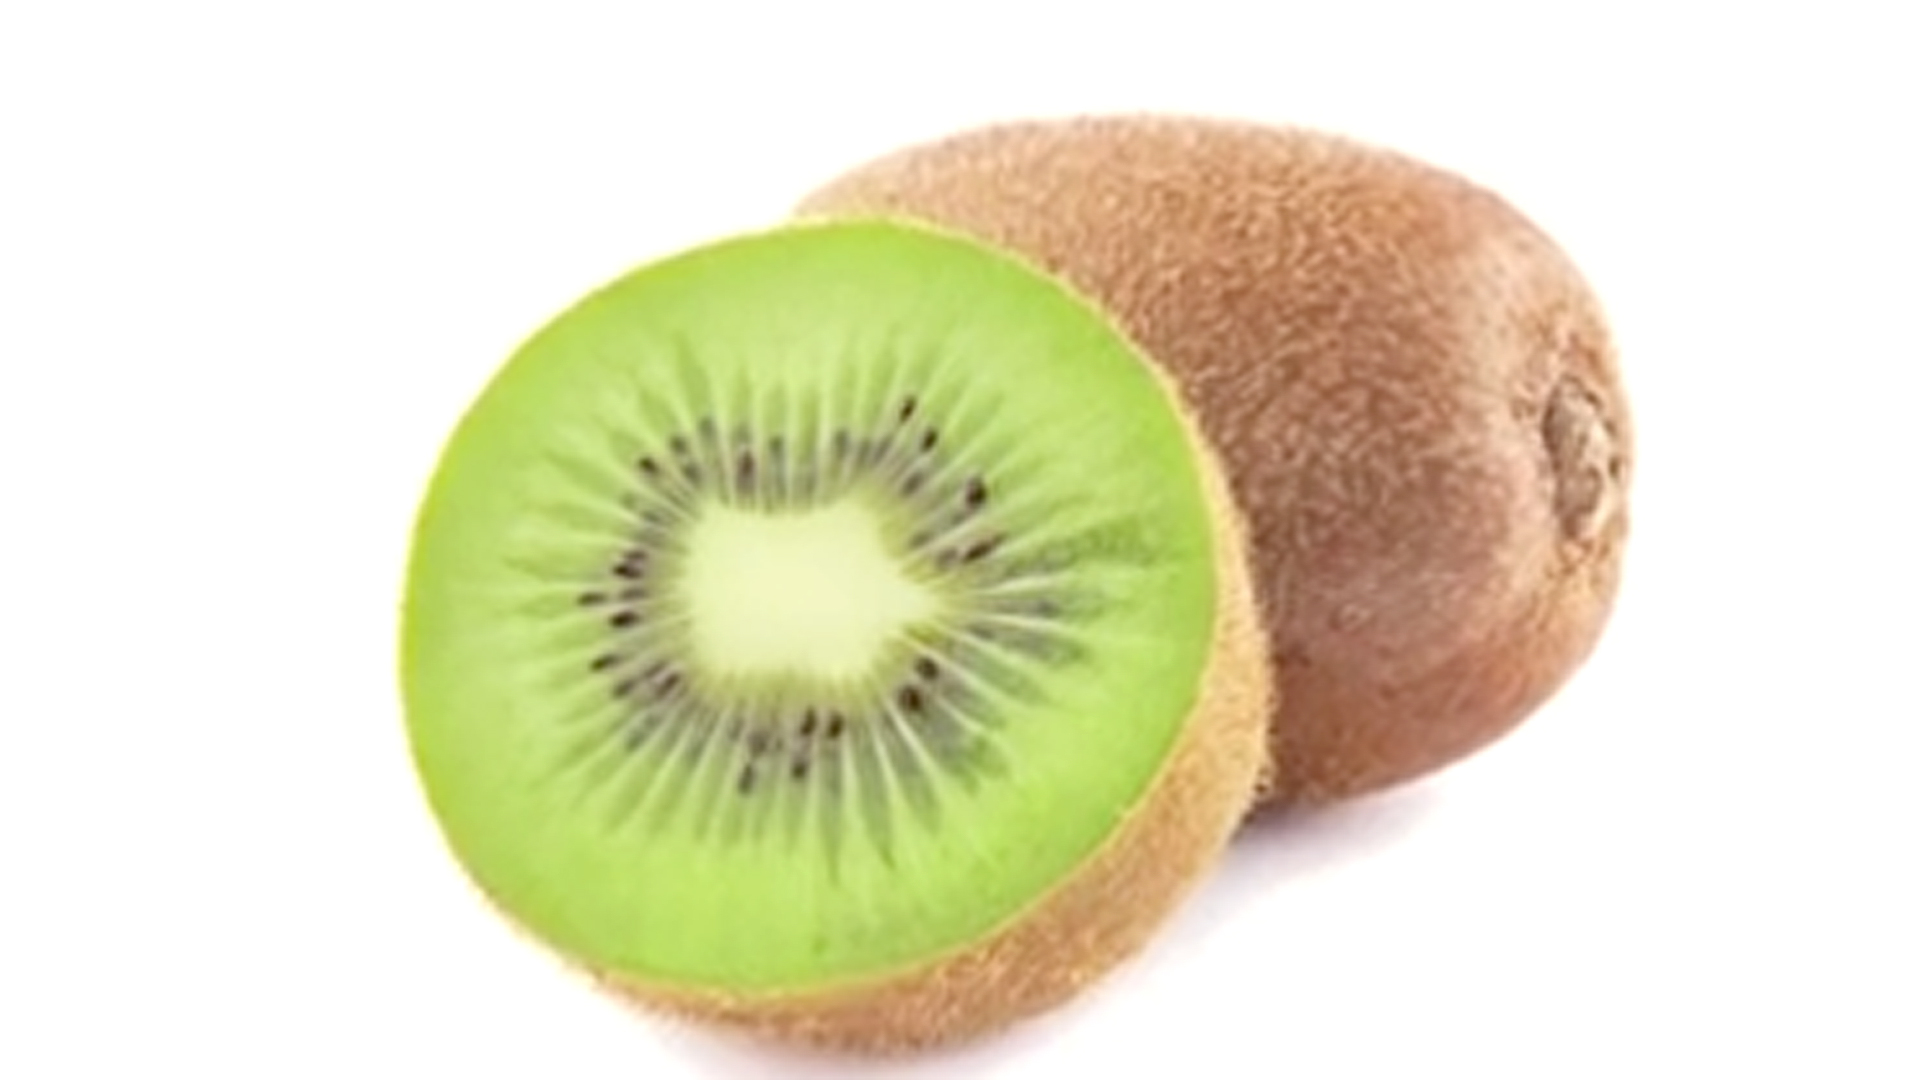 Eat Kiwi to Prevent Heart Disease